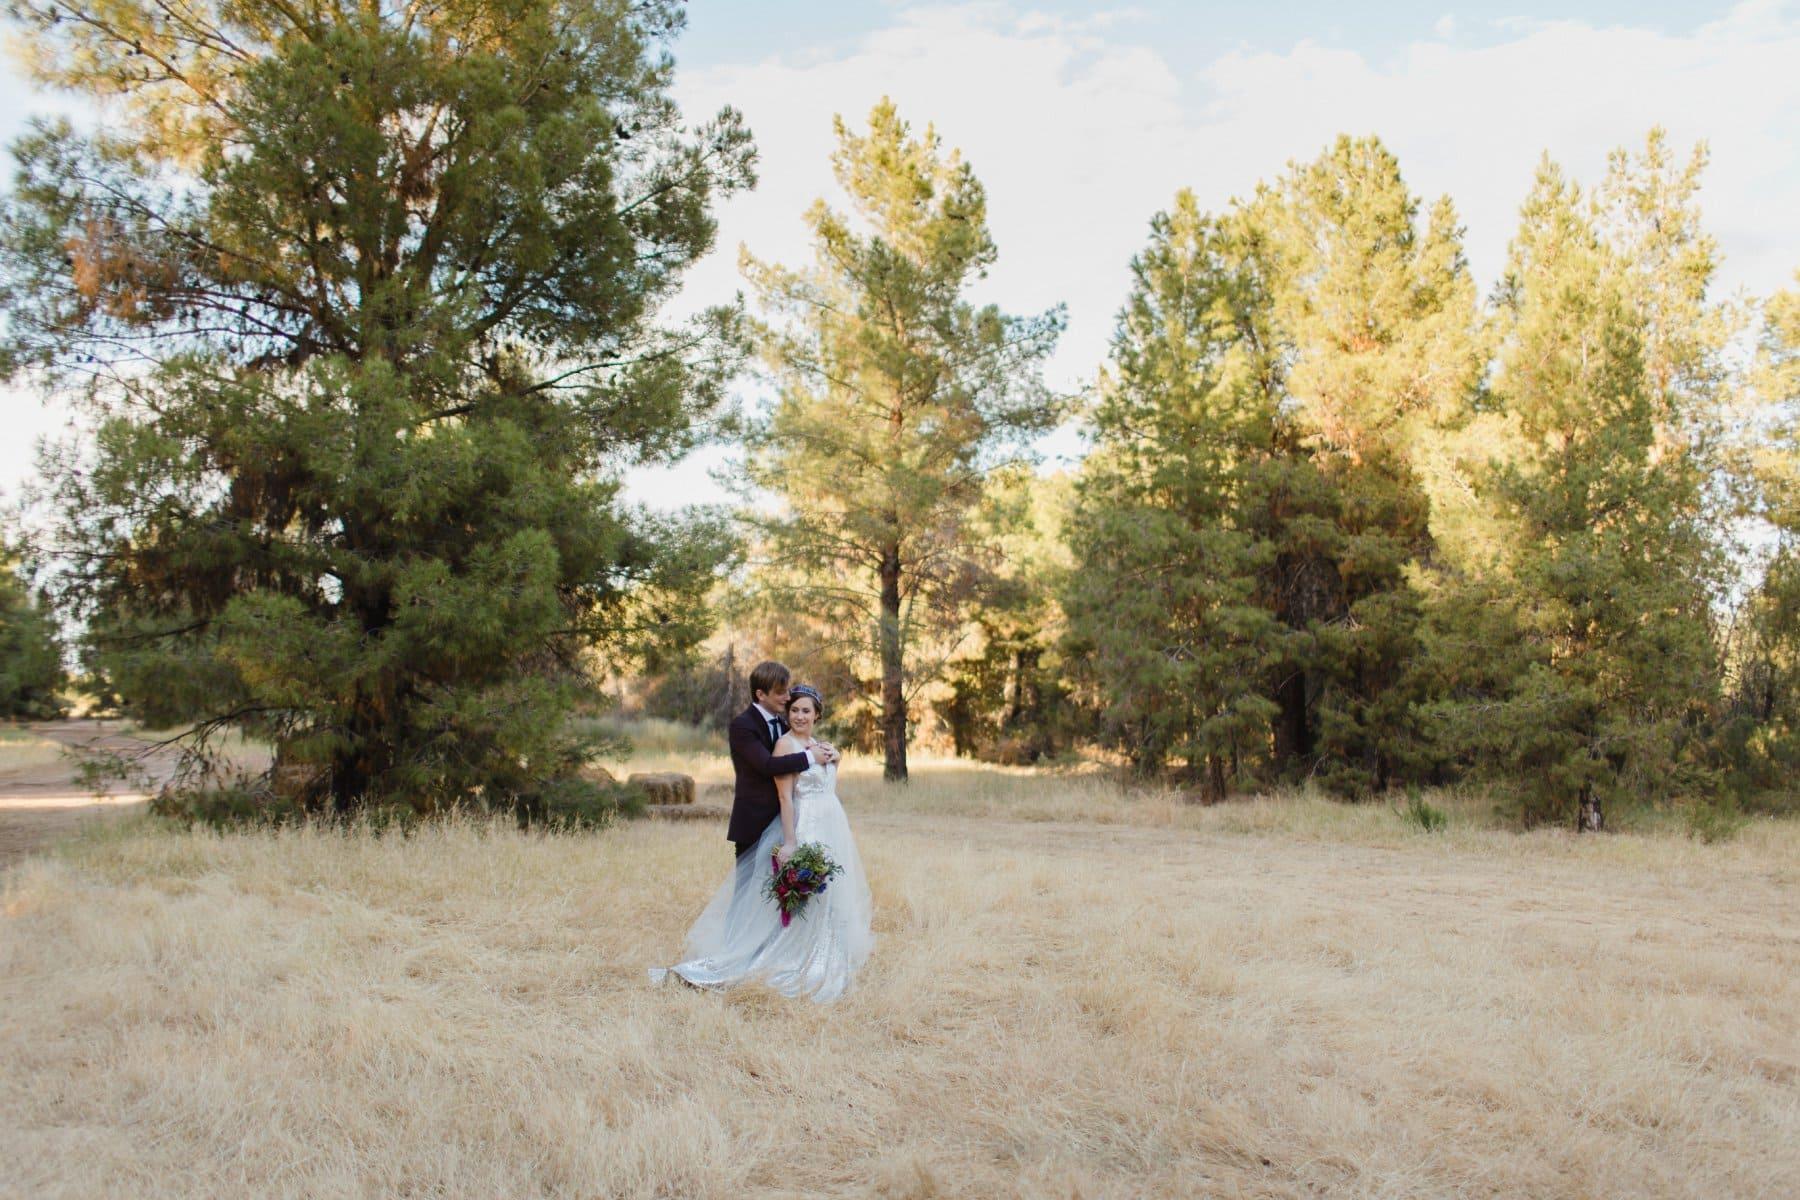 the Meadow at Schnepf Farms wedding venue